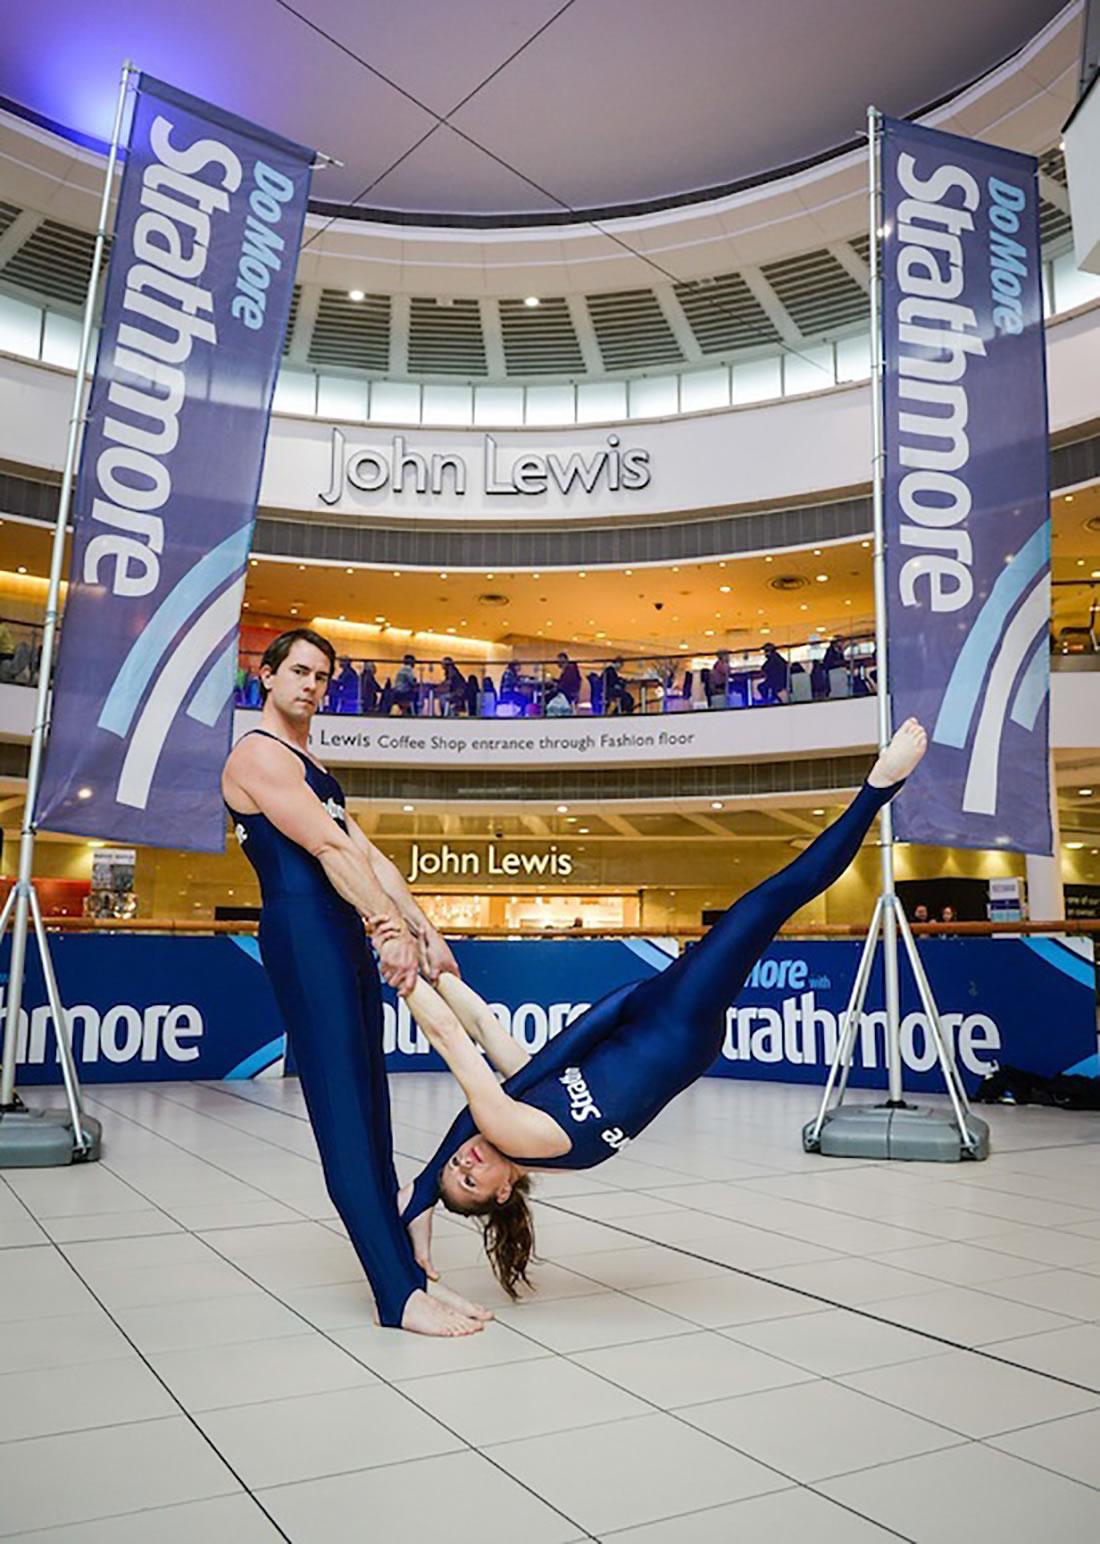 Bespoke Marketing - Gallery - Strathmore launch